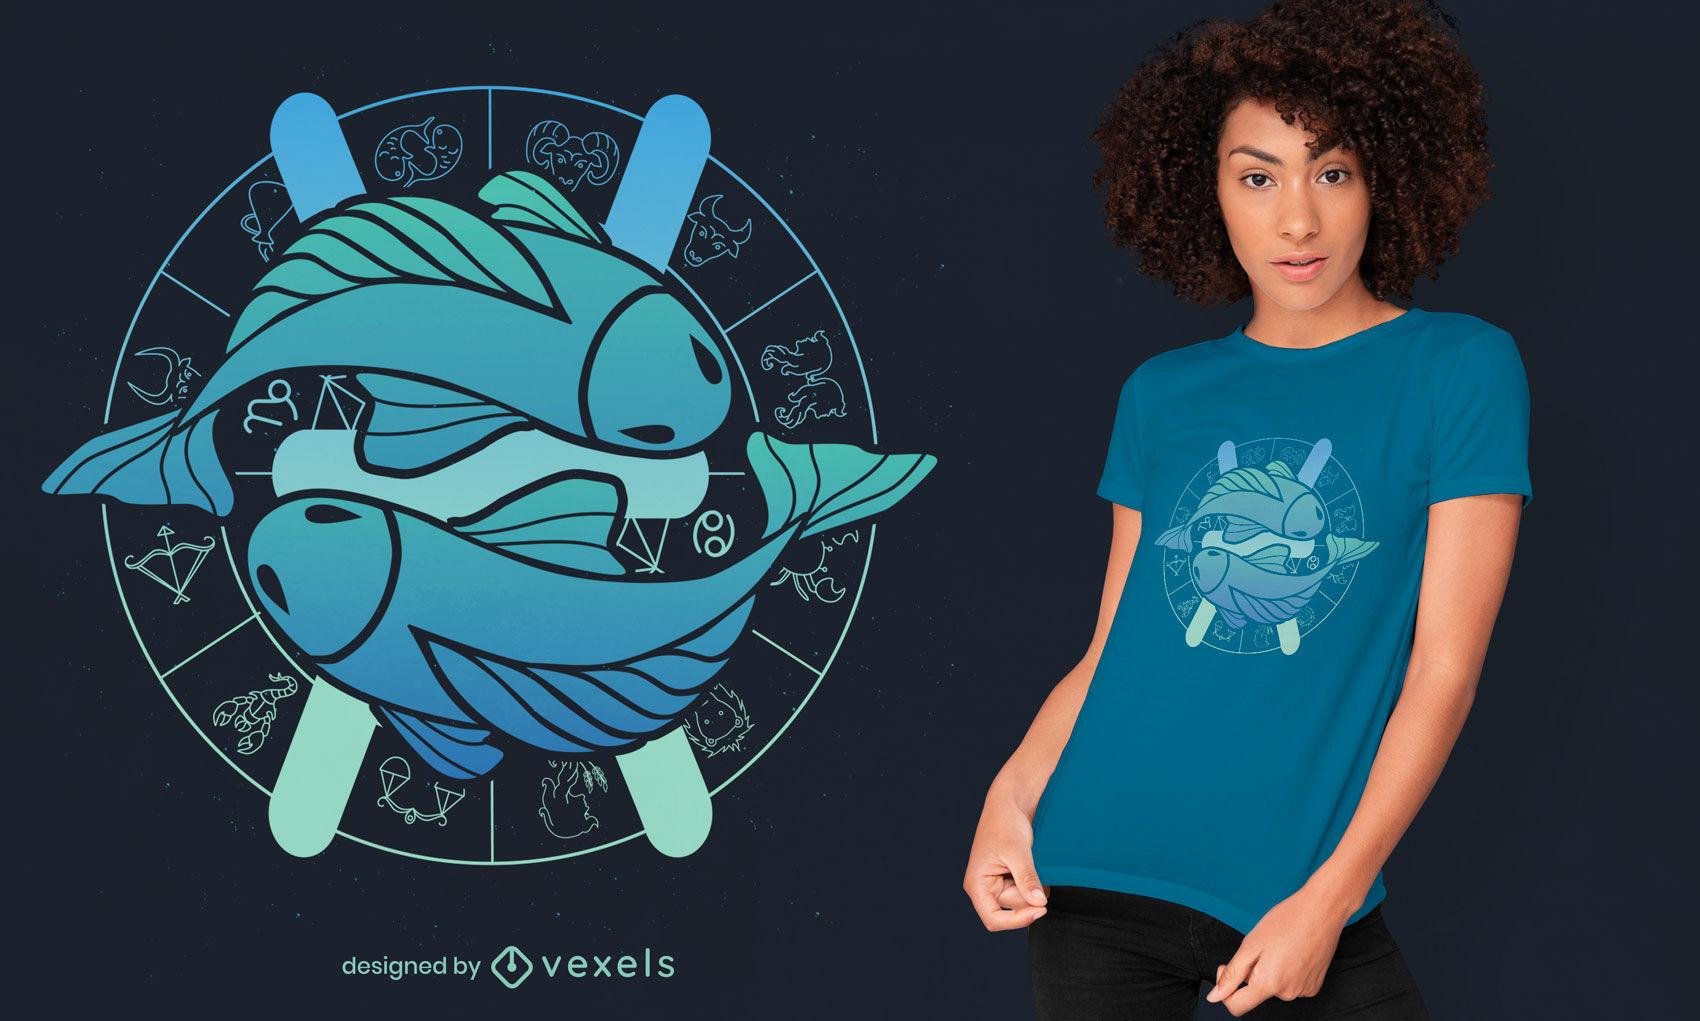 Pisces zodiac sign t-shirt design